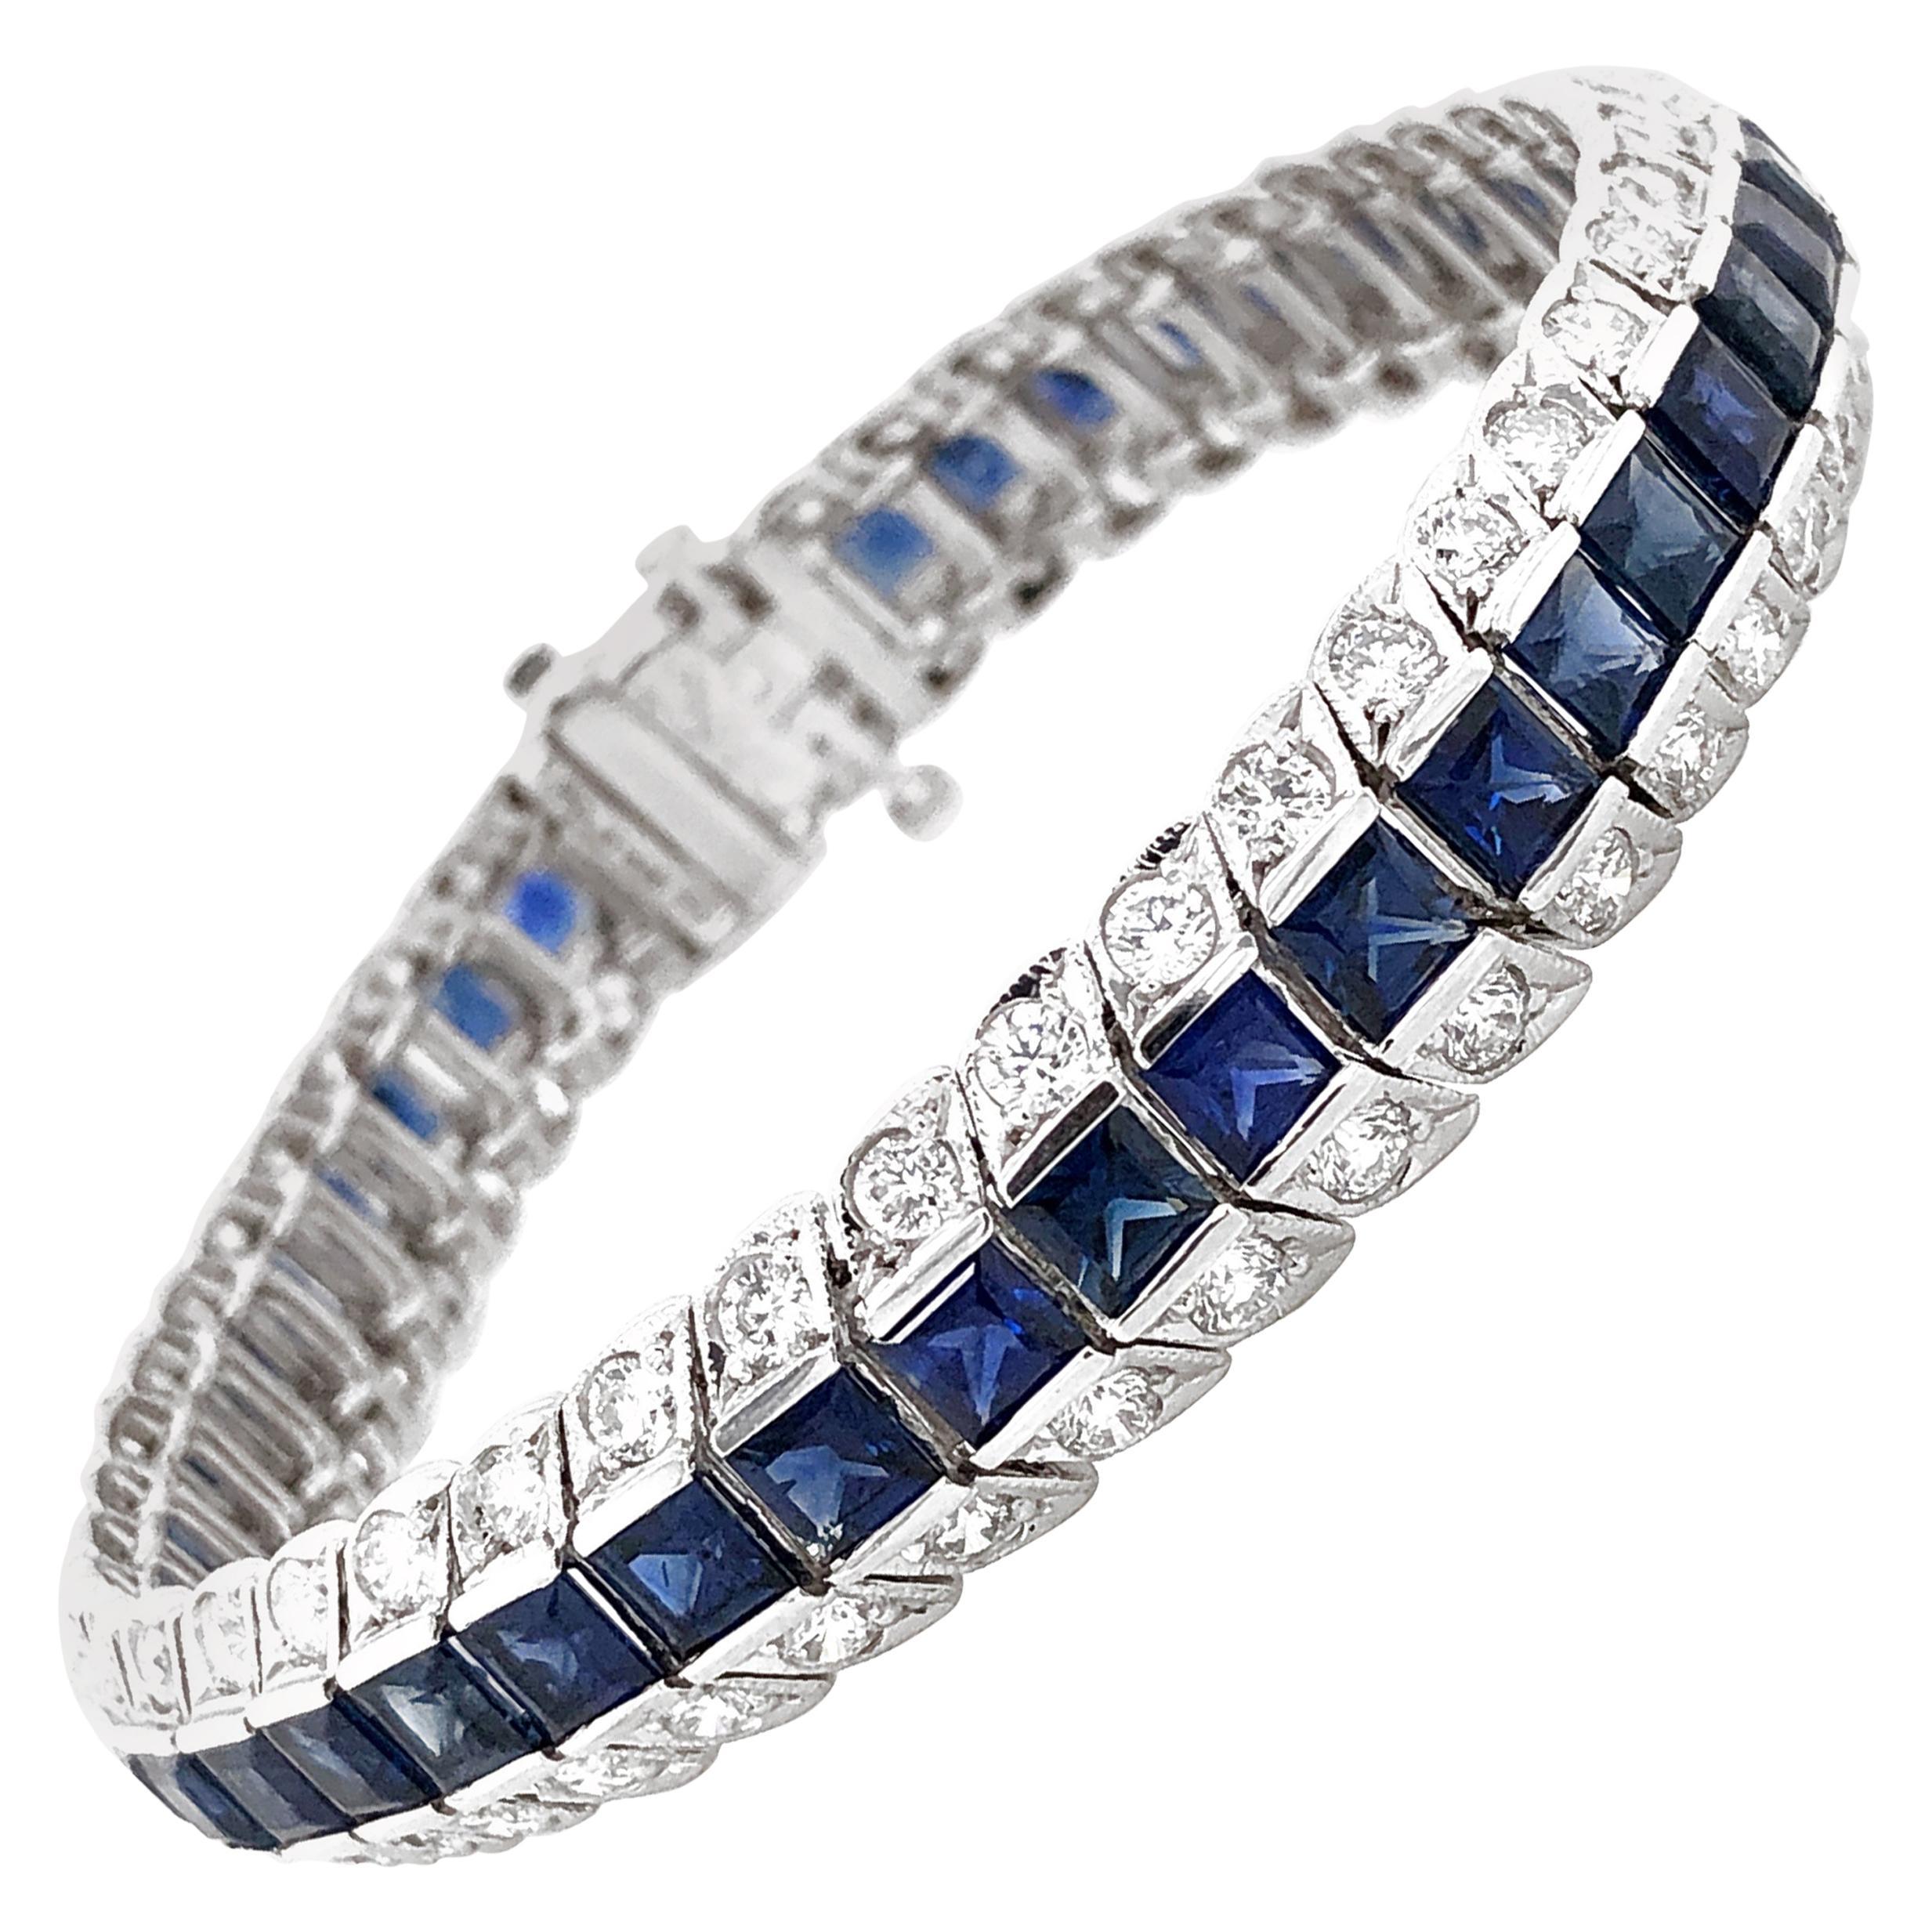 Ceylon Square Cut Blue Sapphires 13.75 Carat Diamond Platinum Link Bracelet